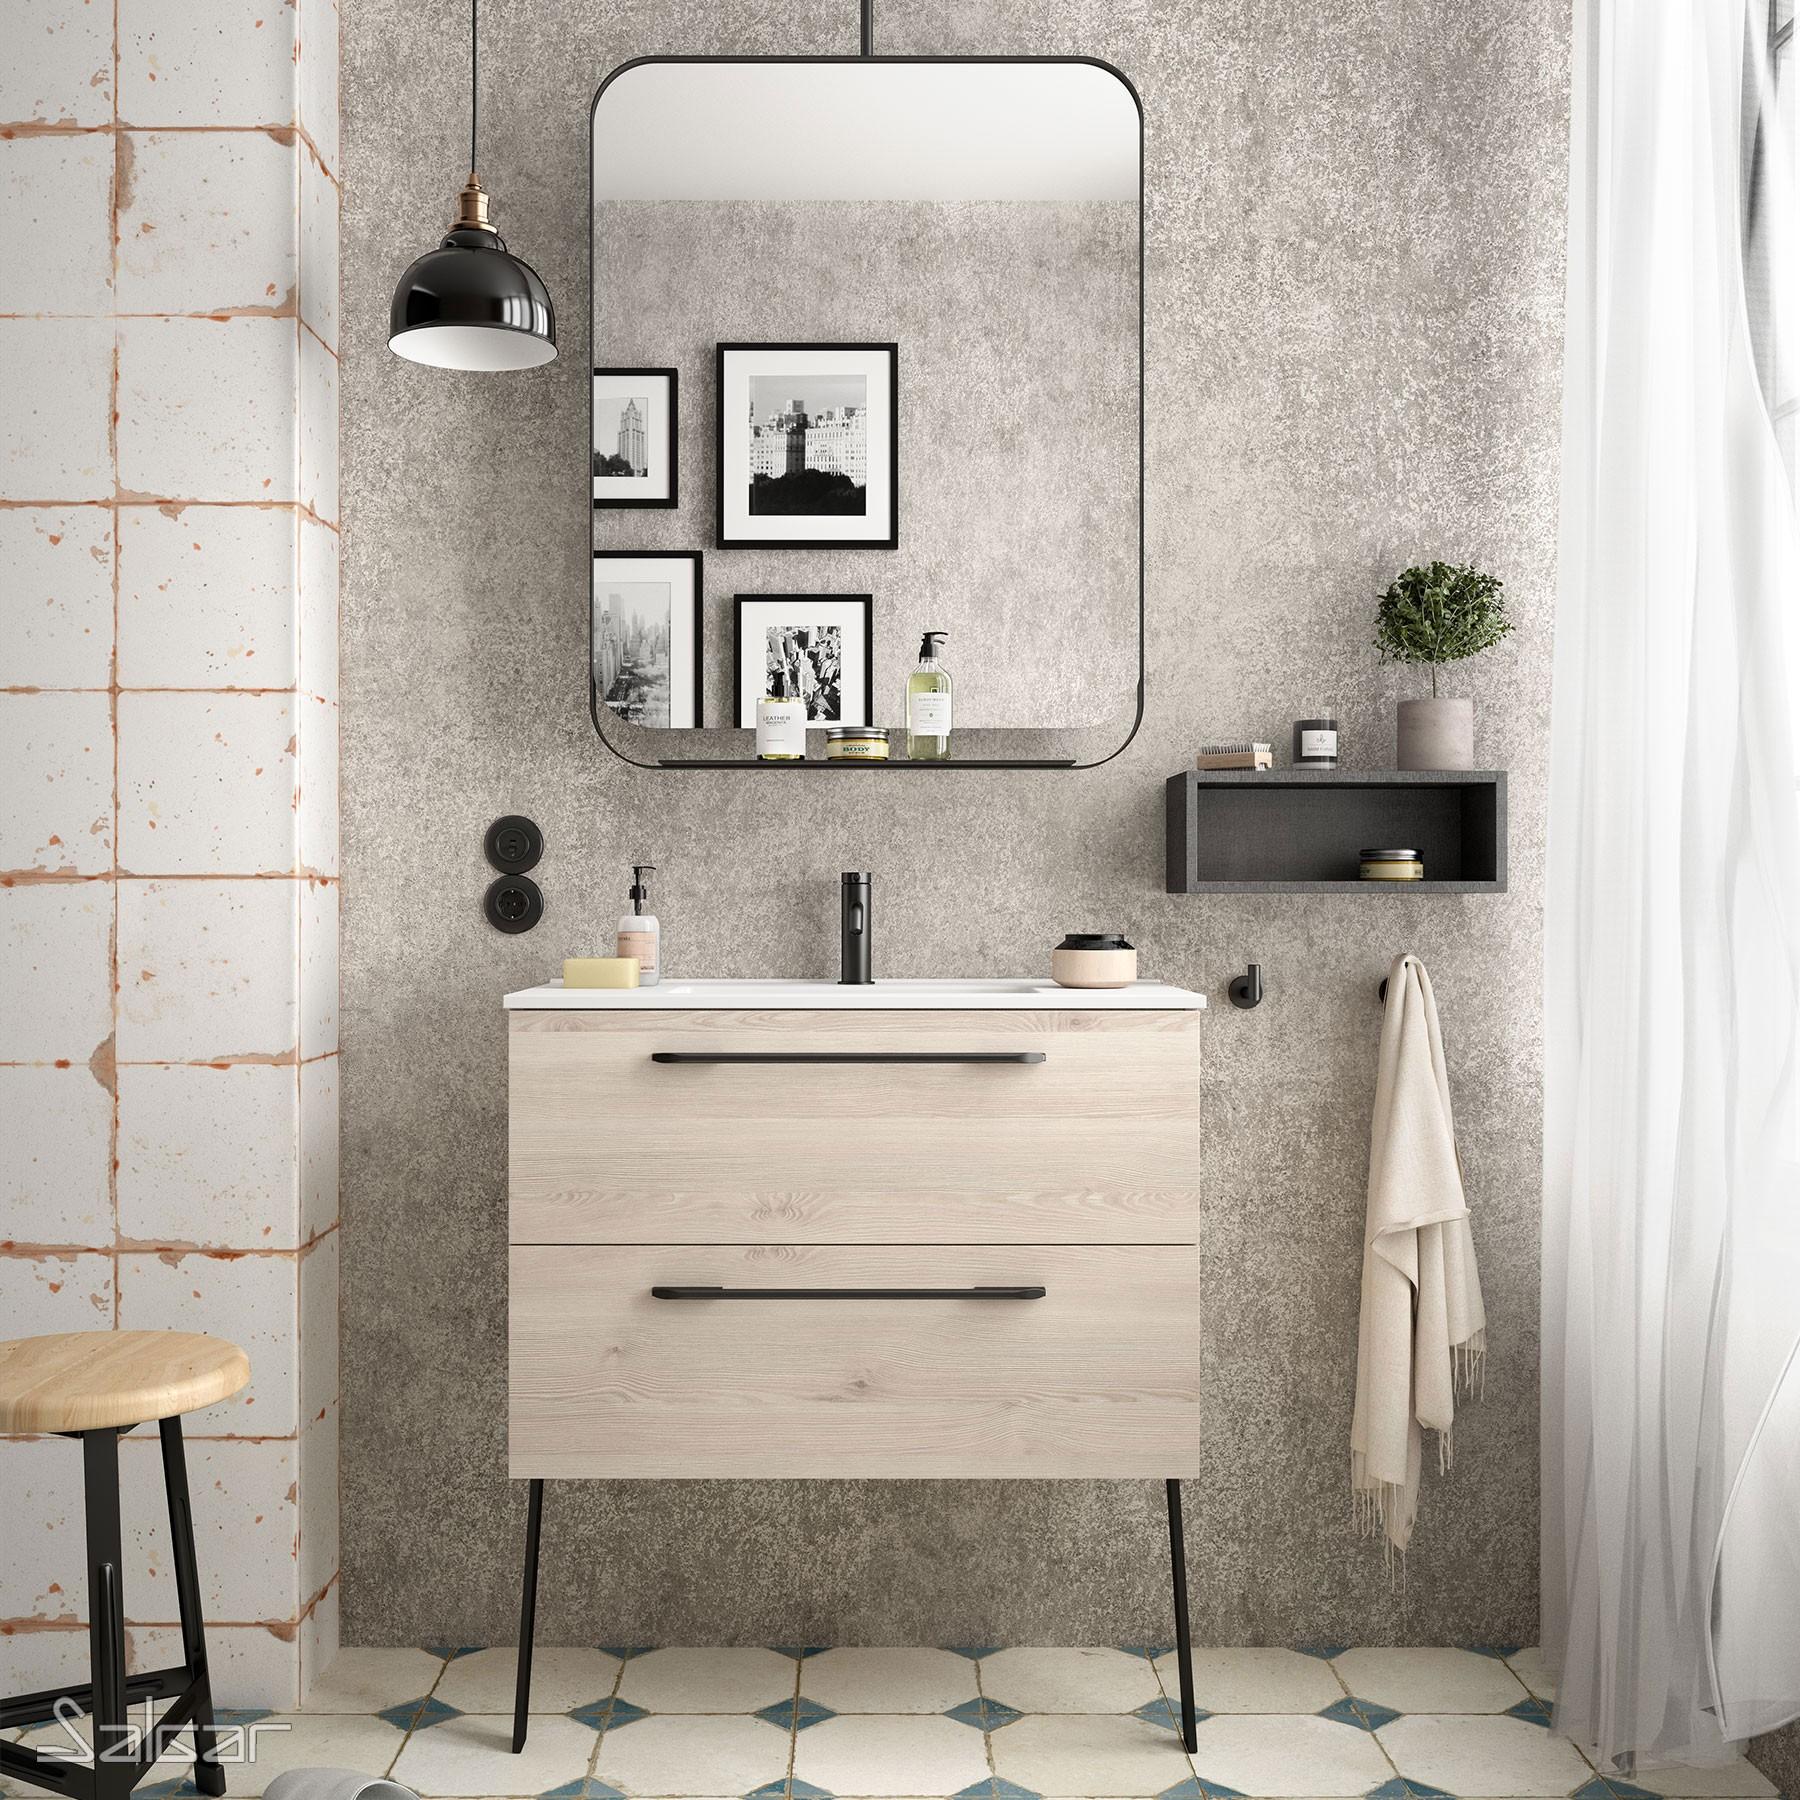 meuble s35 600 2 tiroirs chene naturel 598 x 540 x 346 mm